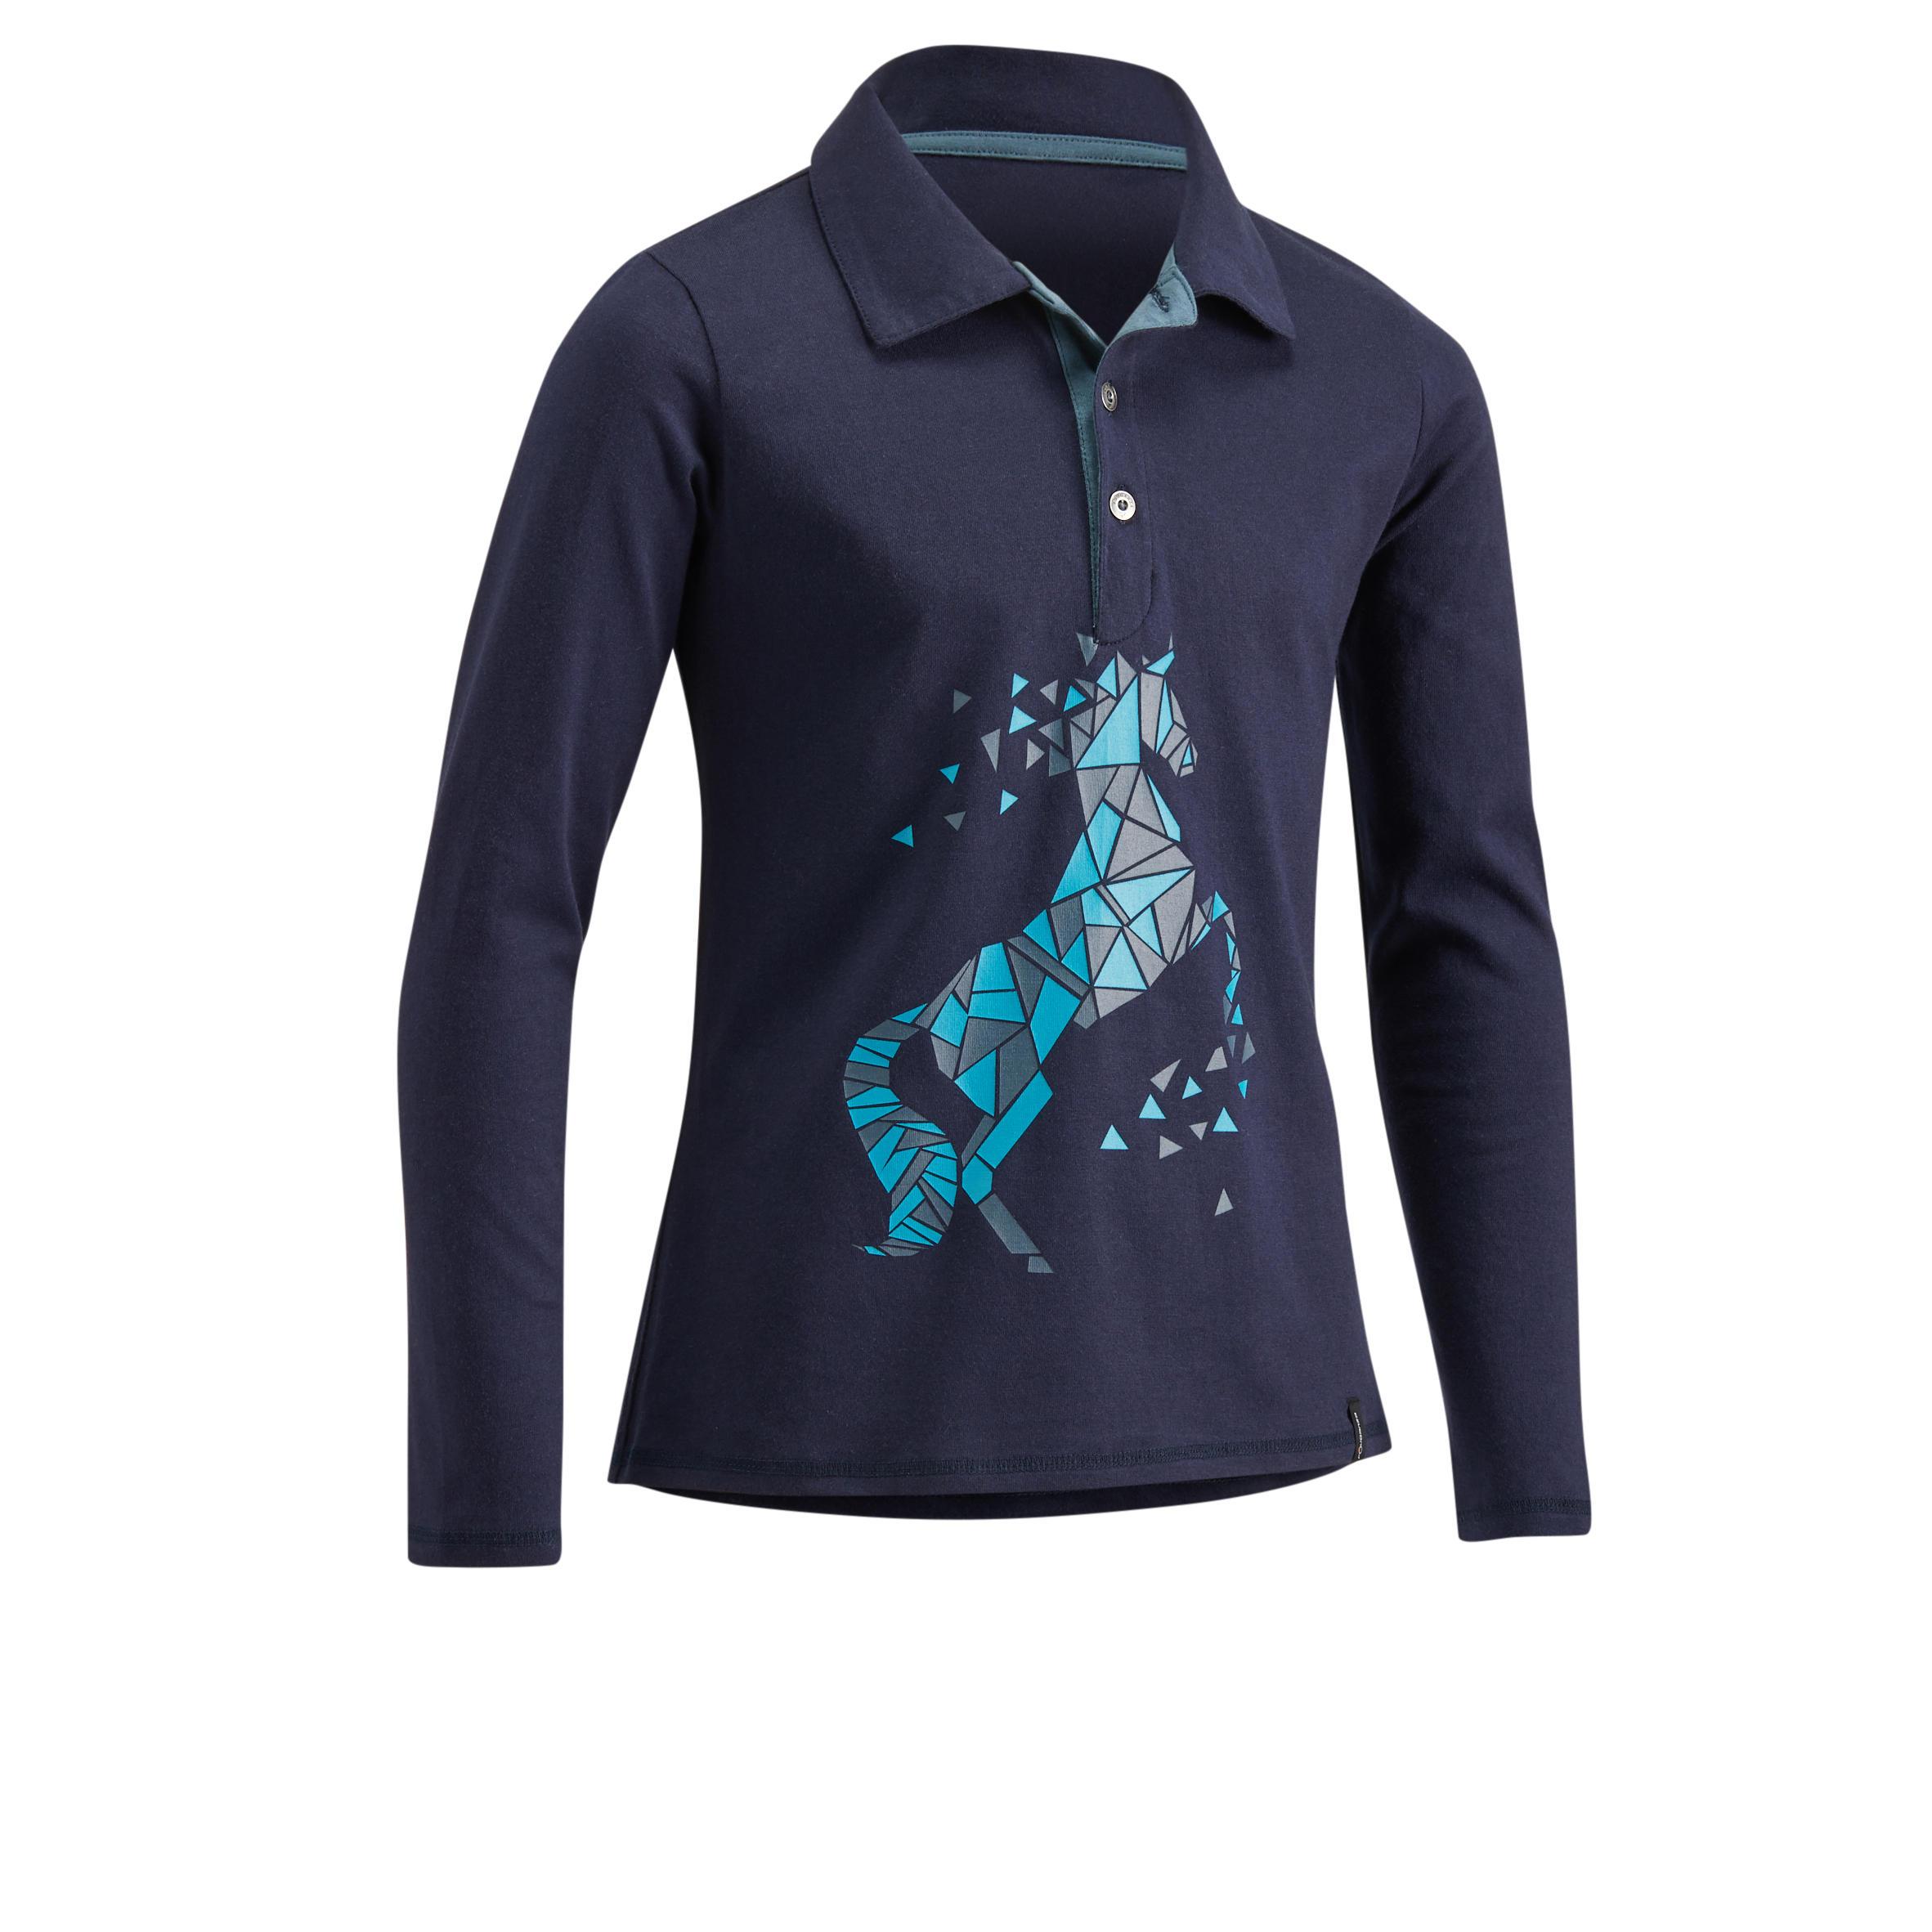 Fouganza Polo lange mouwen ruitersport meisjes 140 GIRL marineblauw/turquoise